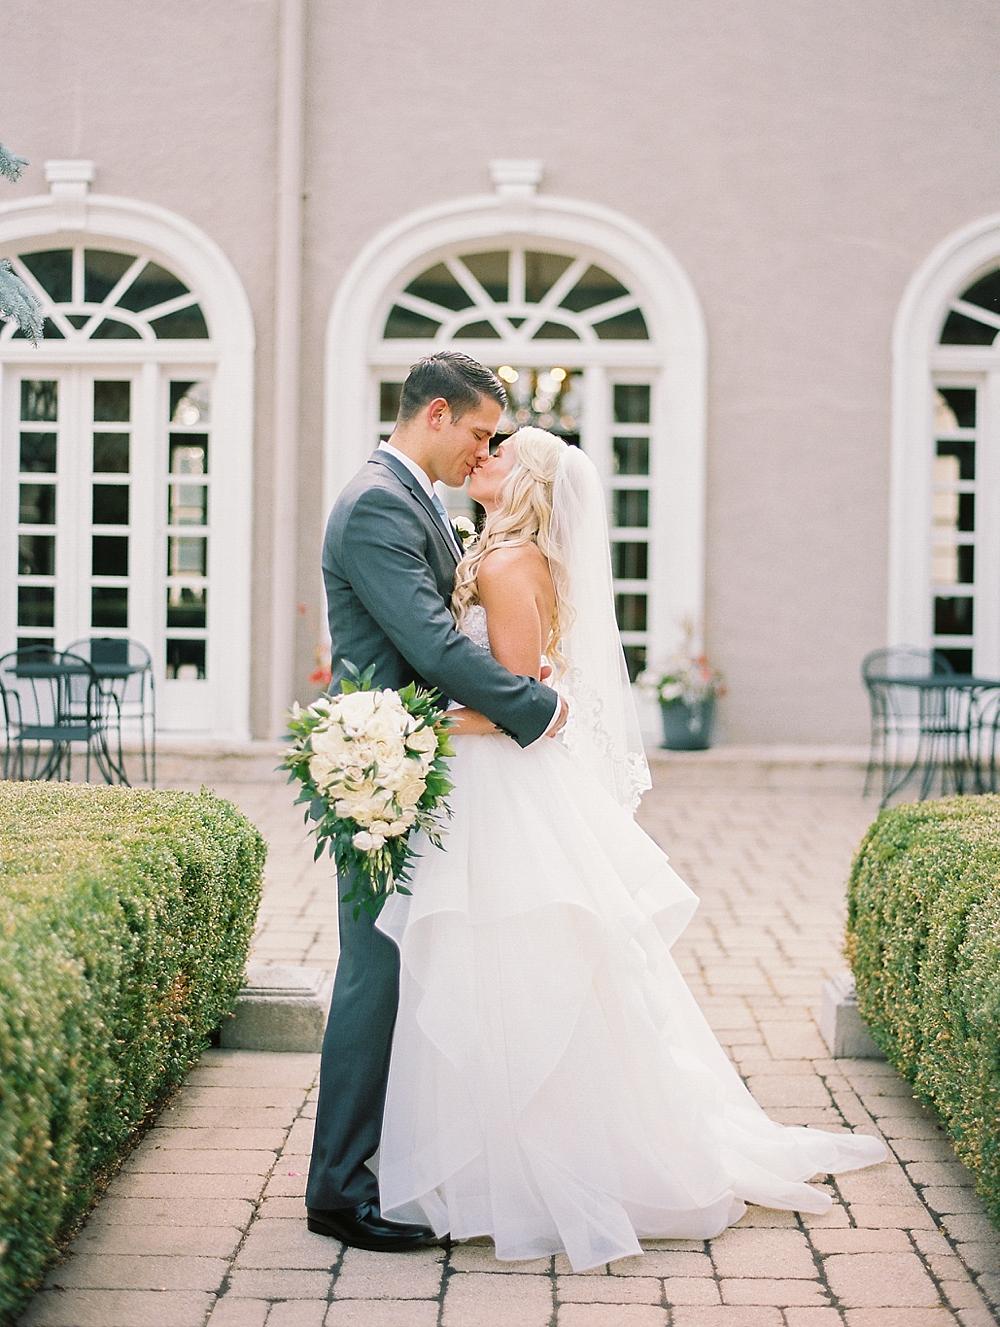 kristin-la-voie-photography-lehmann-mansion-wedding-photographer-85